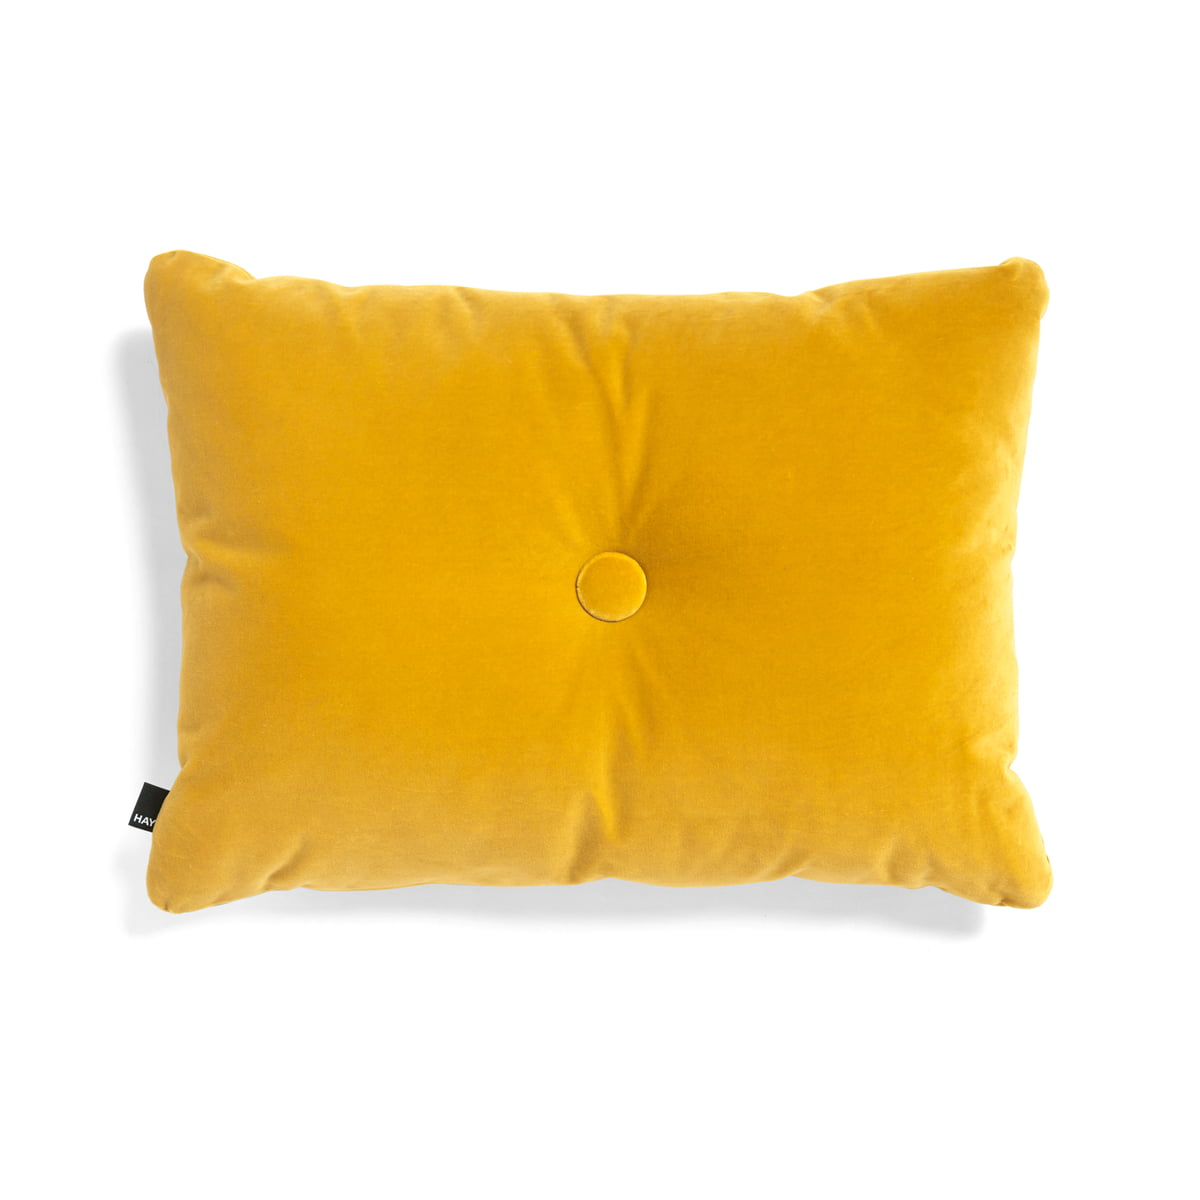 hay kissen dot soft 45 x 60 cm gelb gelb h 45 b 60. Black Bedroom Furniture Sets. Home Design Ideas